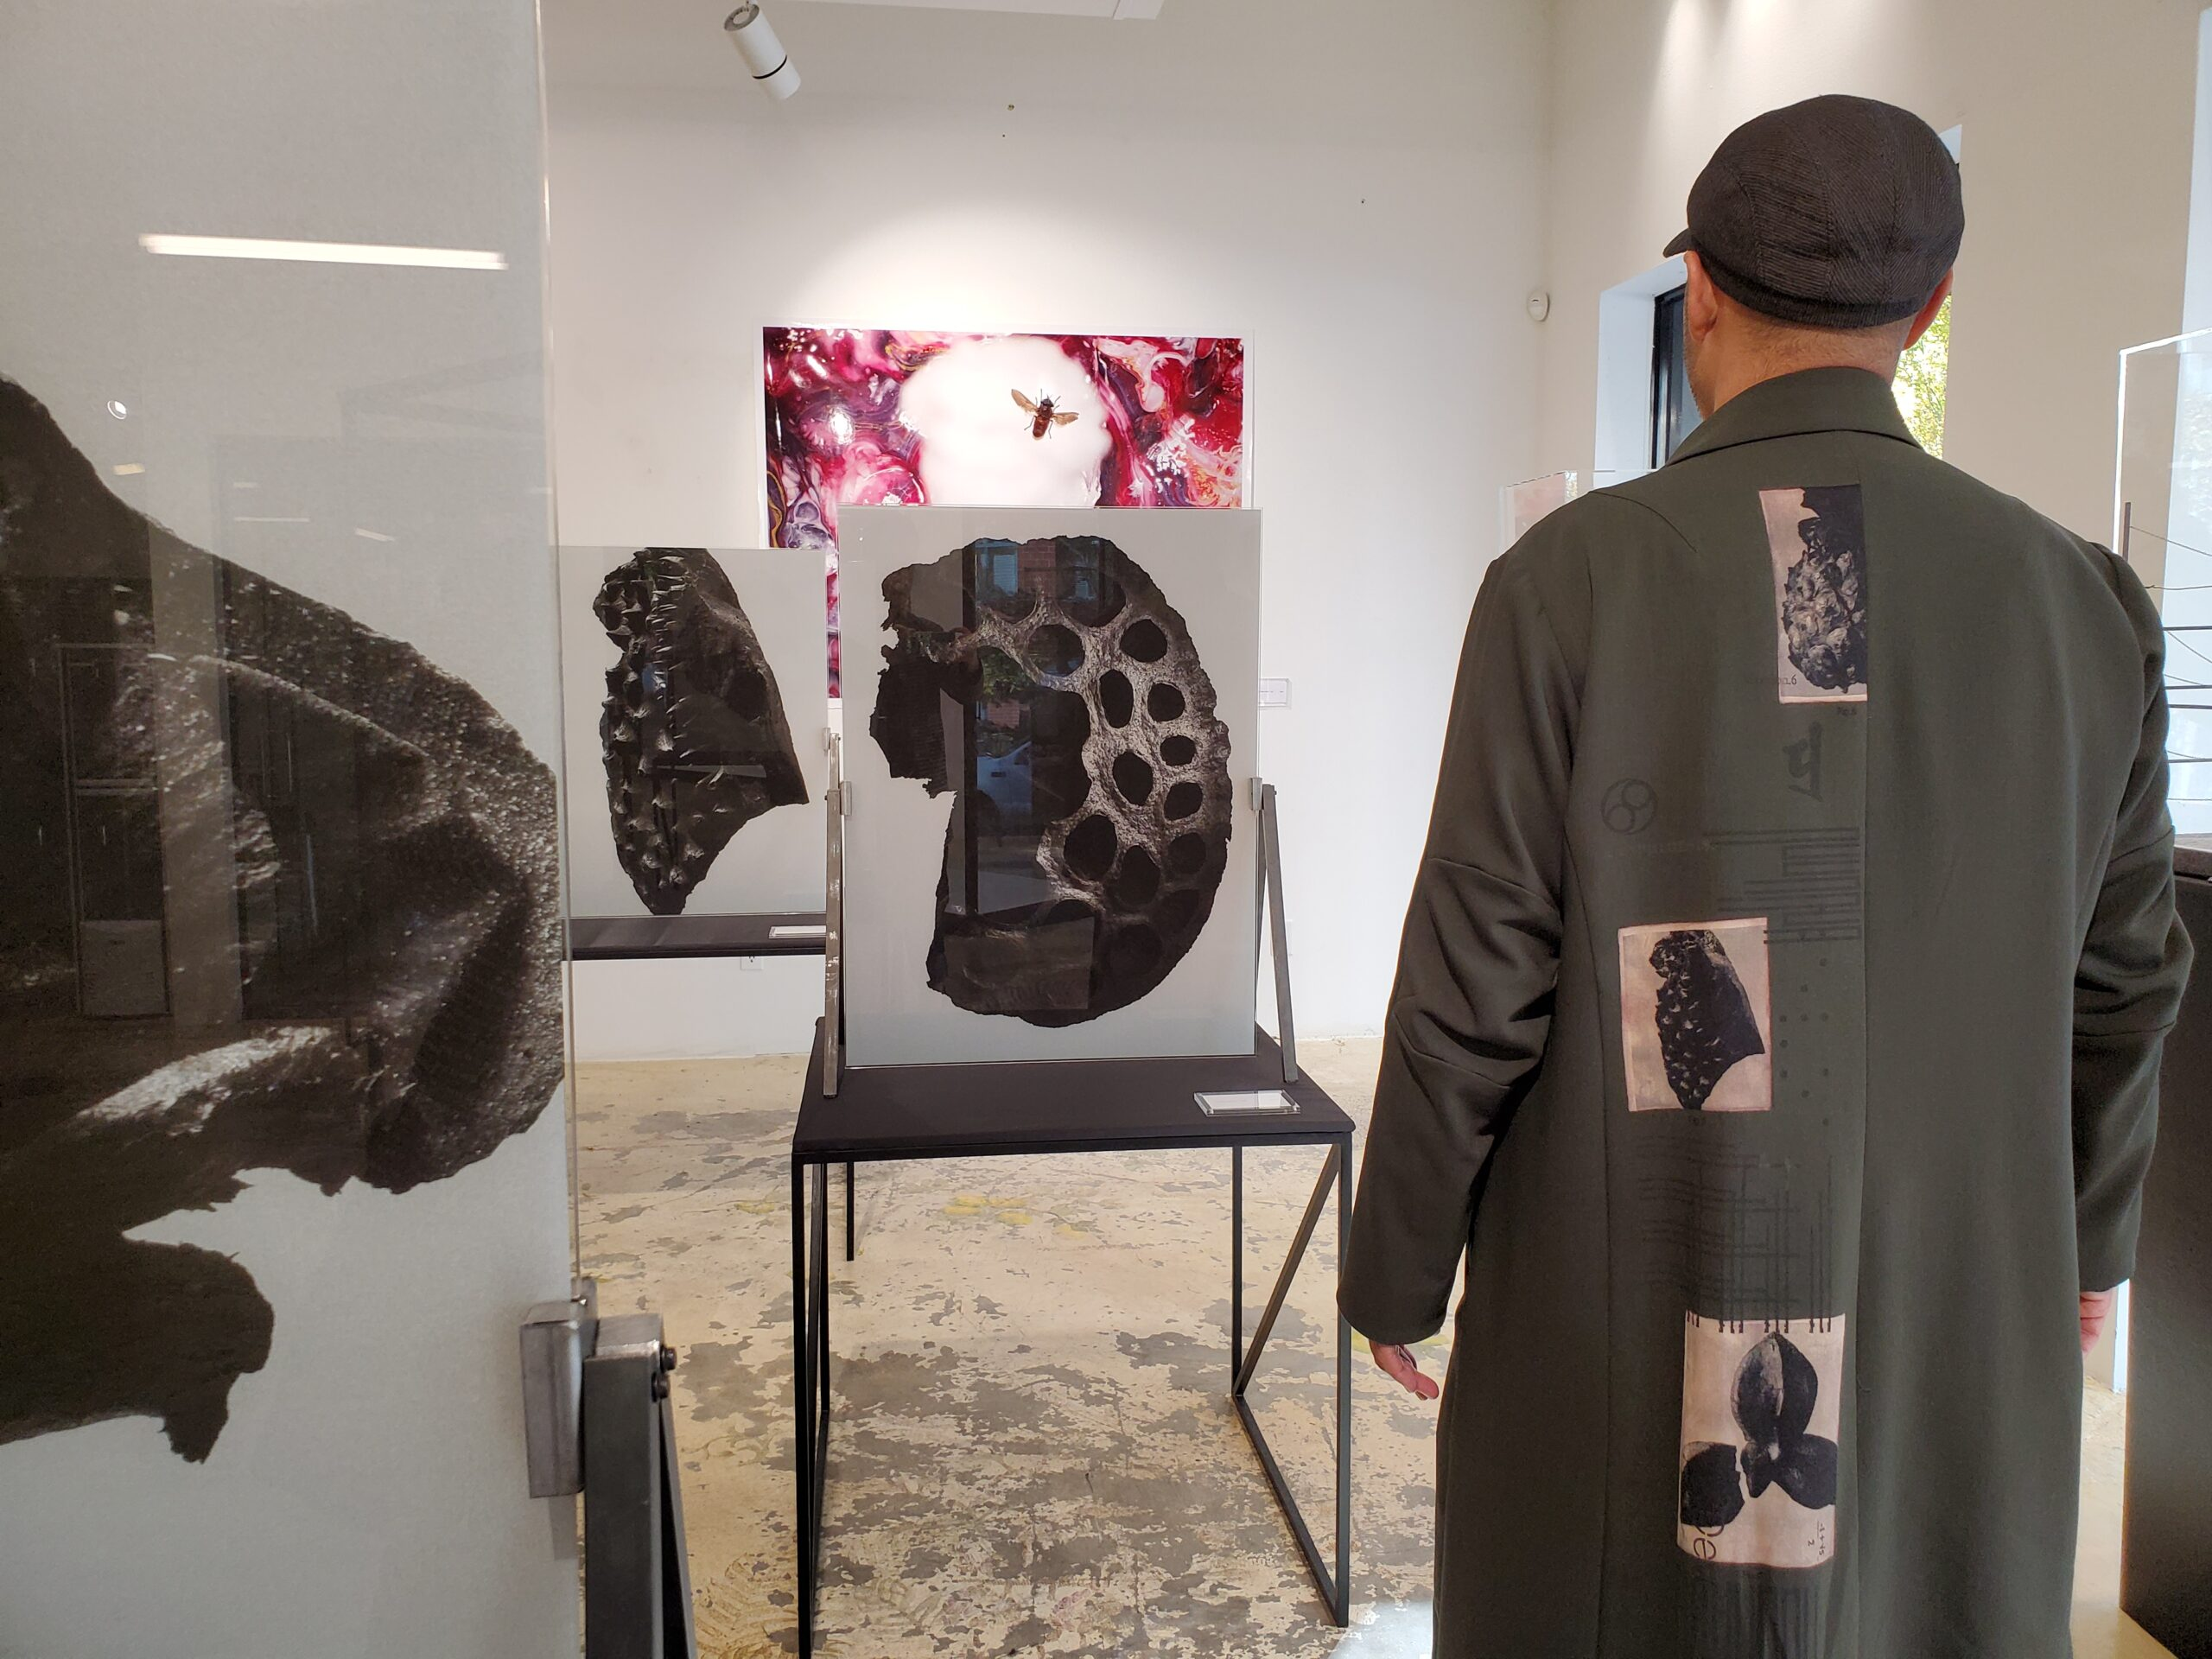 DEVOA, Daisuke Nishida, japanese designer, leisure center, helen siwak, coleman pete, yaletown, vancouver, bc, vancity, yvr, bc, ecoluxluv, folioyvr, luxury